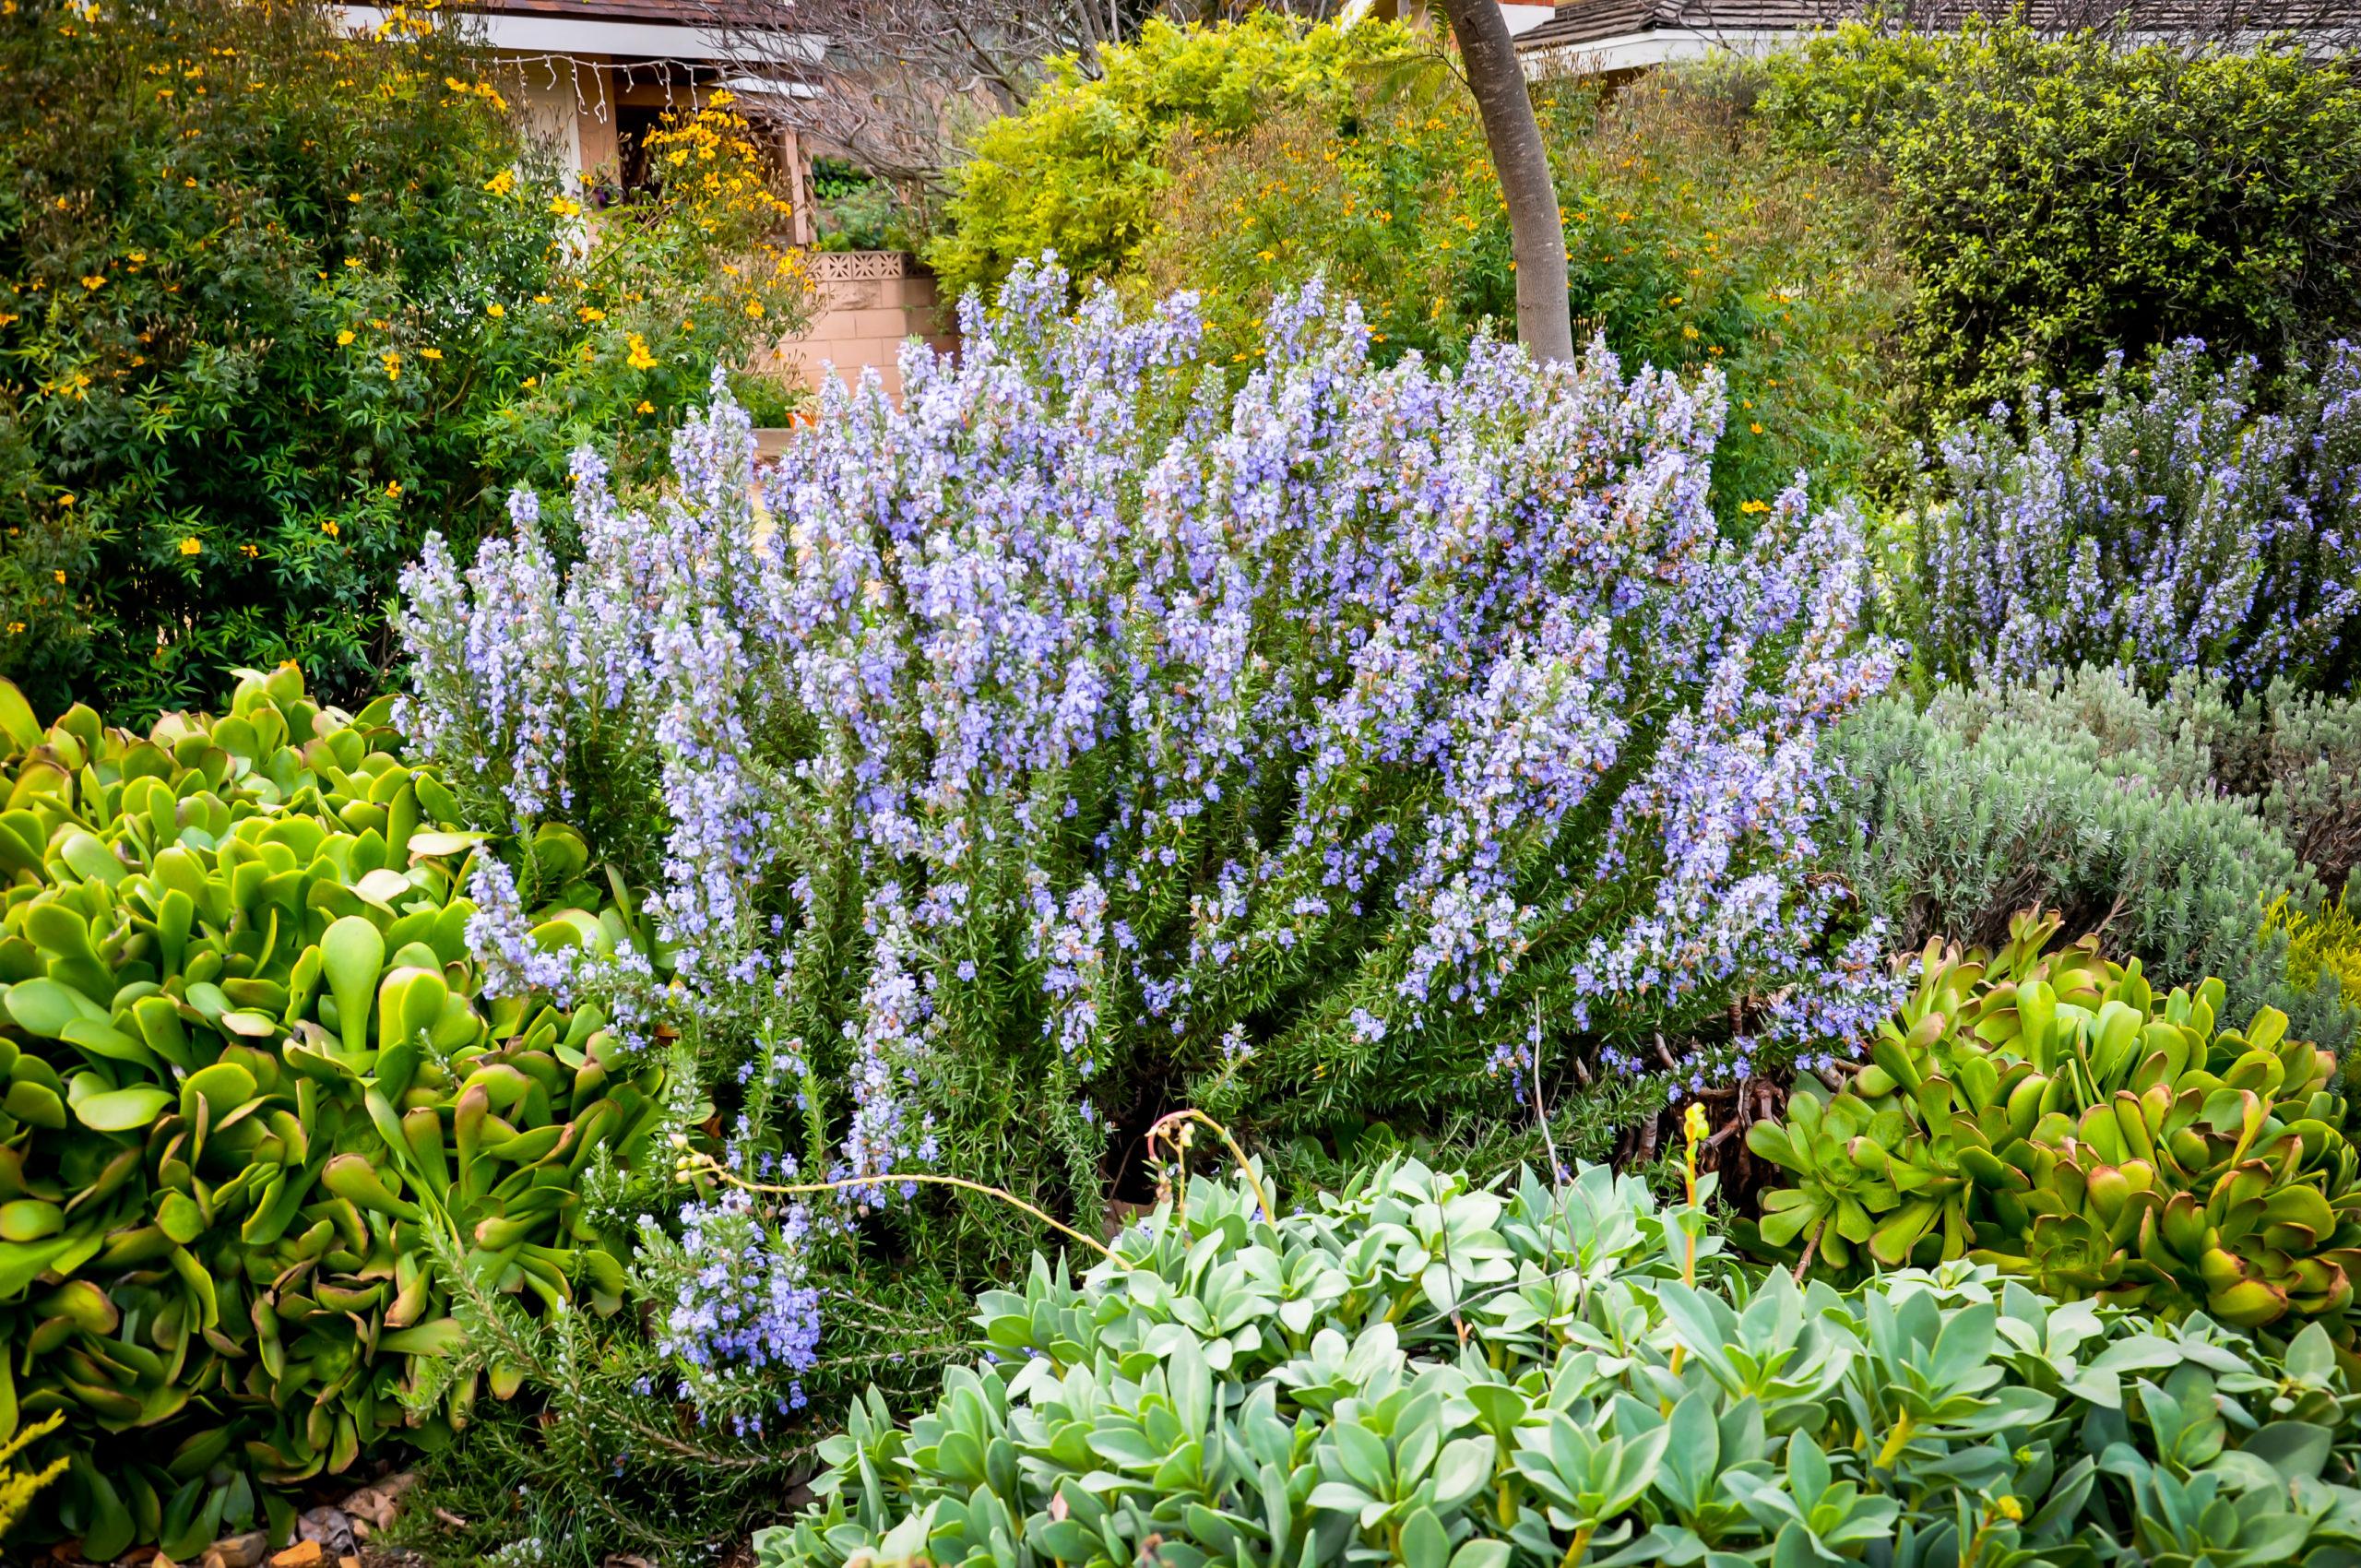 Rosemary - Rosmarinus officinalis 'Tuscan Blue'